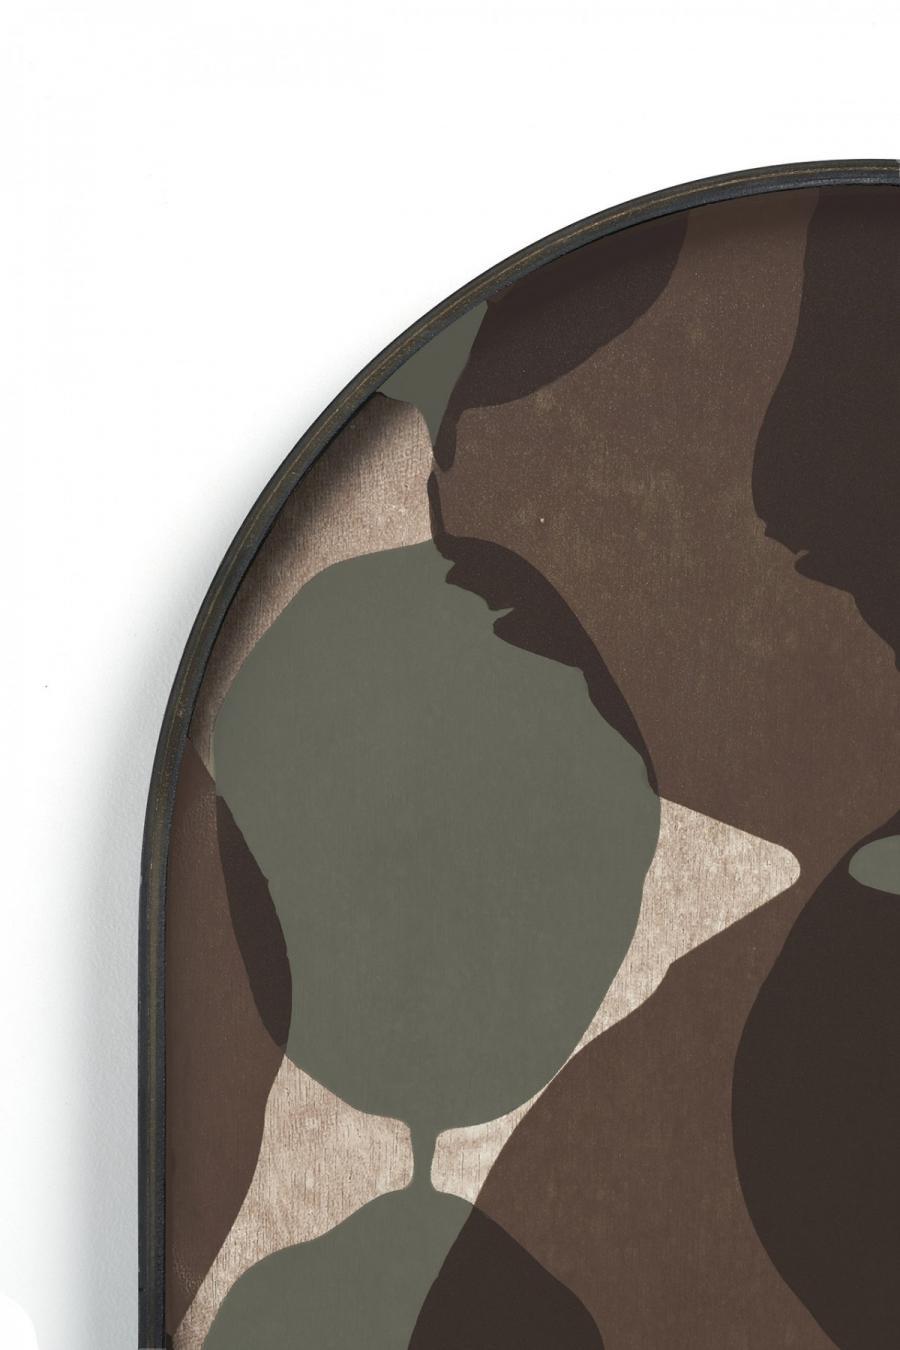 Ethnicraft - Ovalen dienbladen - Connected Dots glazen dienblad - M